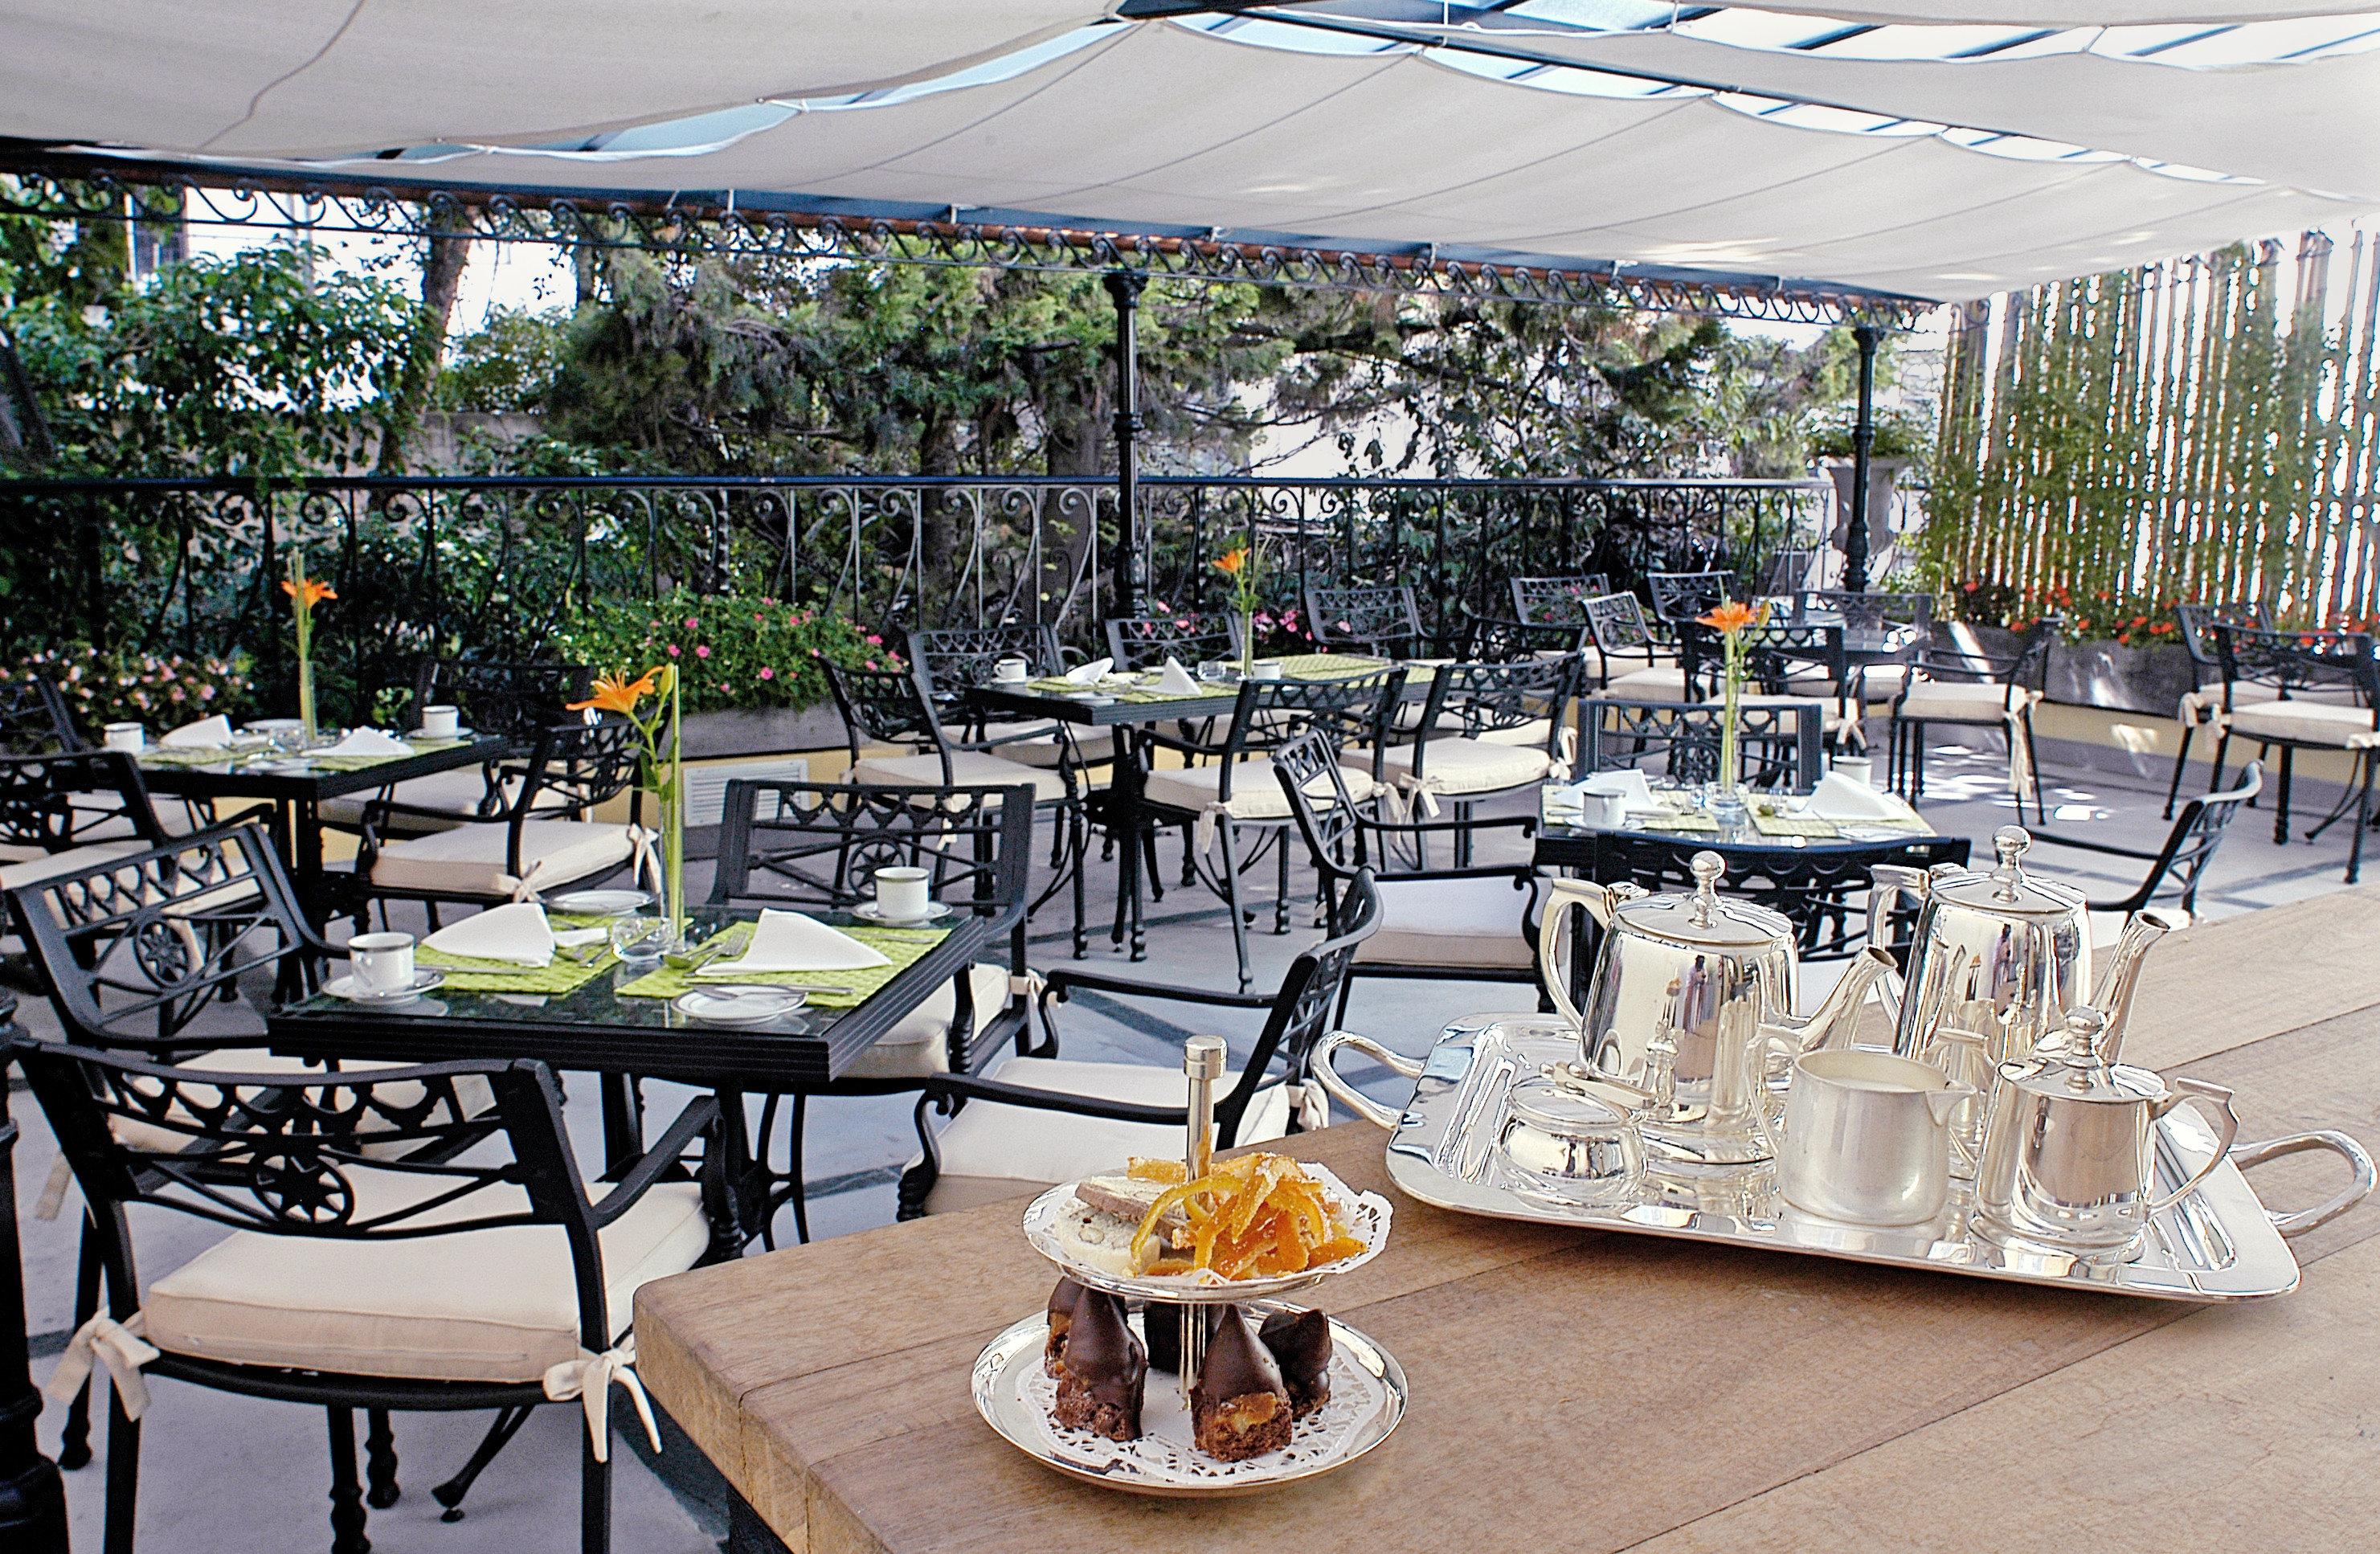 City Classic Cultural Drink Eat Patio Terrace restaurant banquet